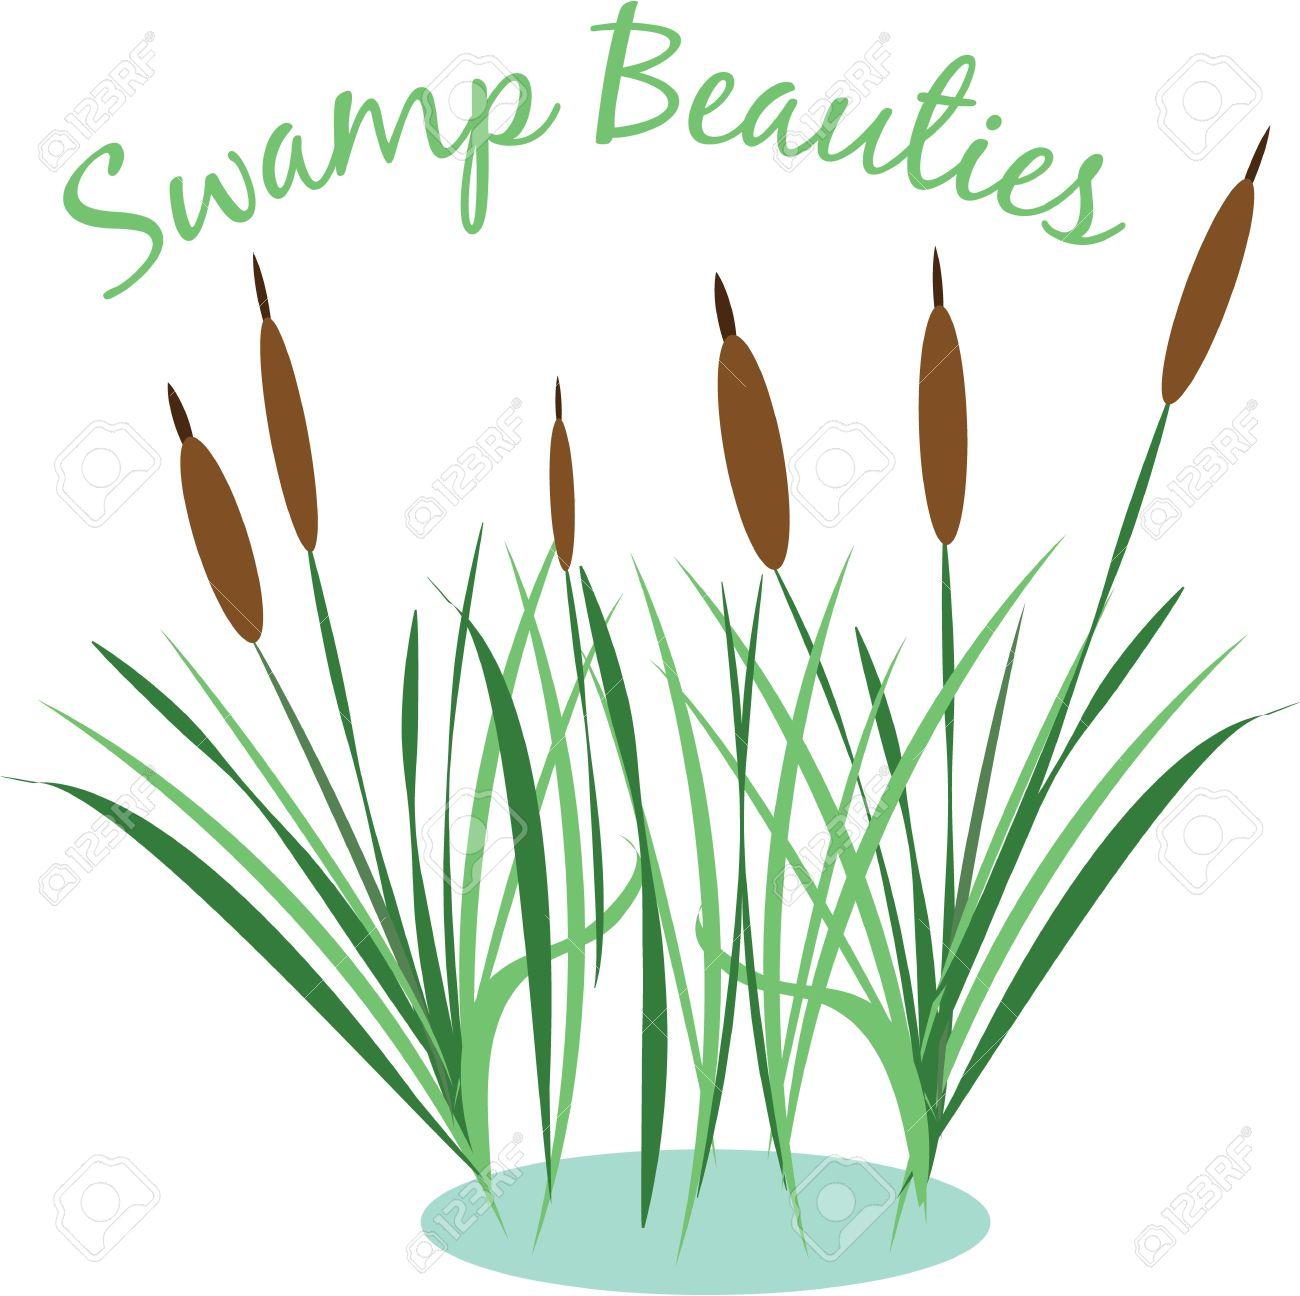 A Bog Cliparts, Stock Vector And Royalty Free A Bog Illustrations.